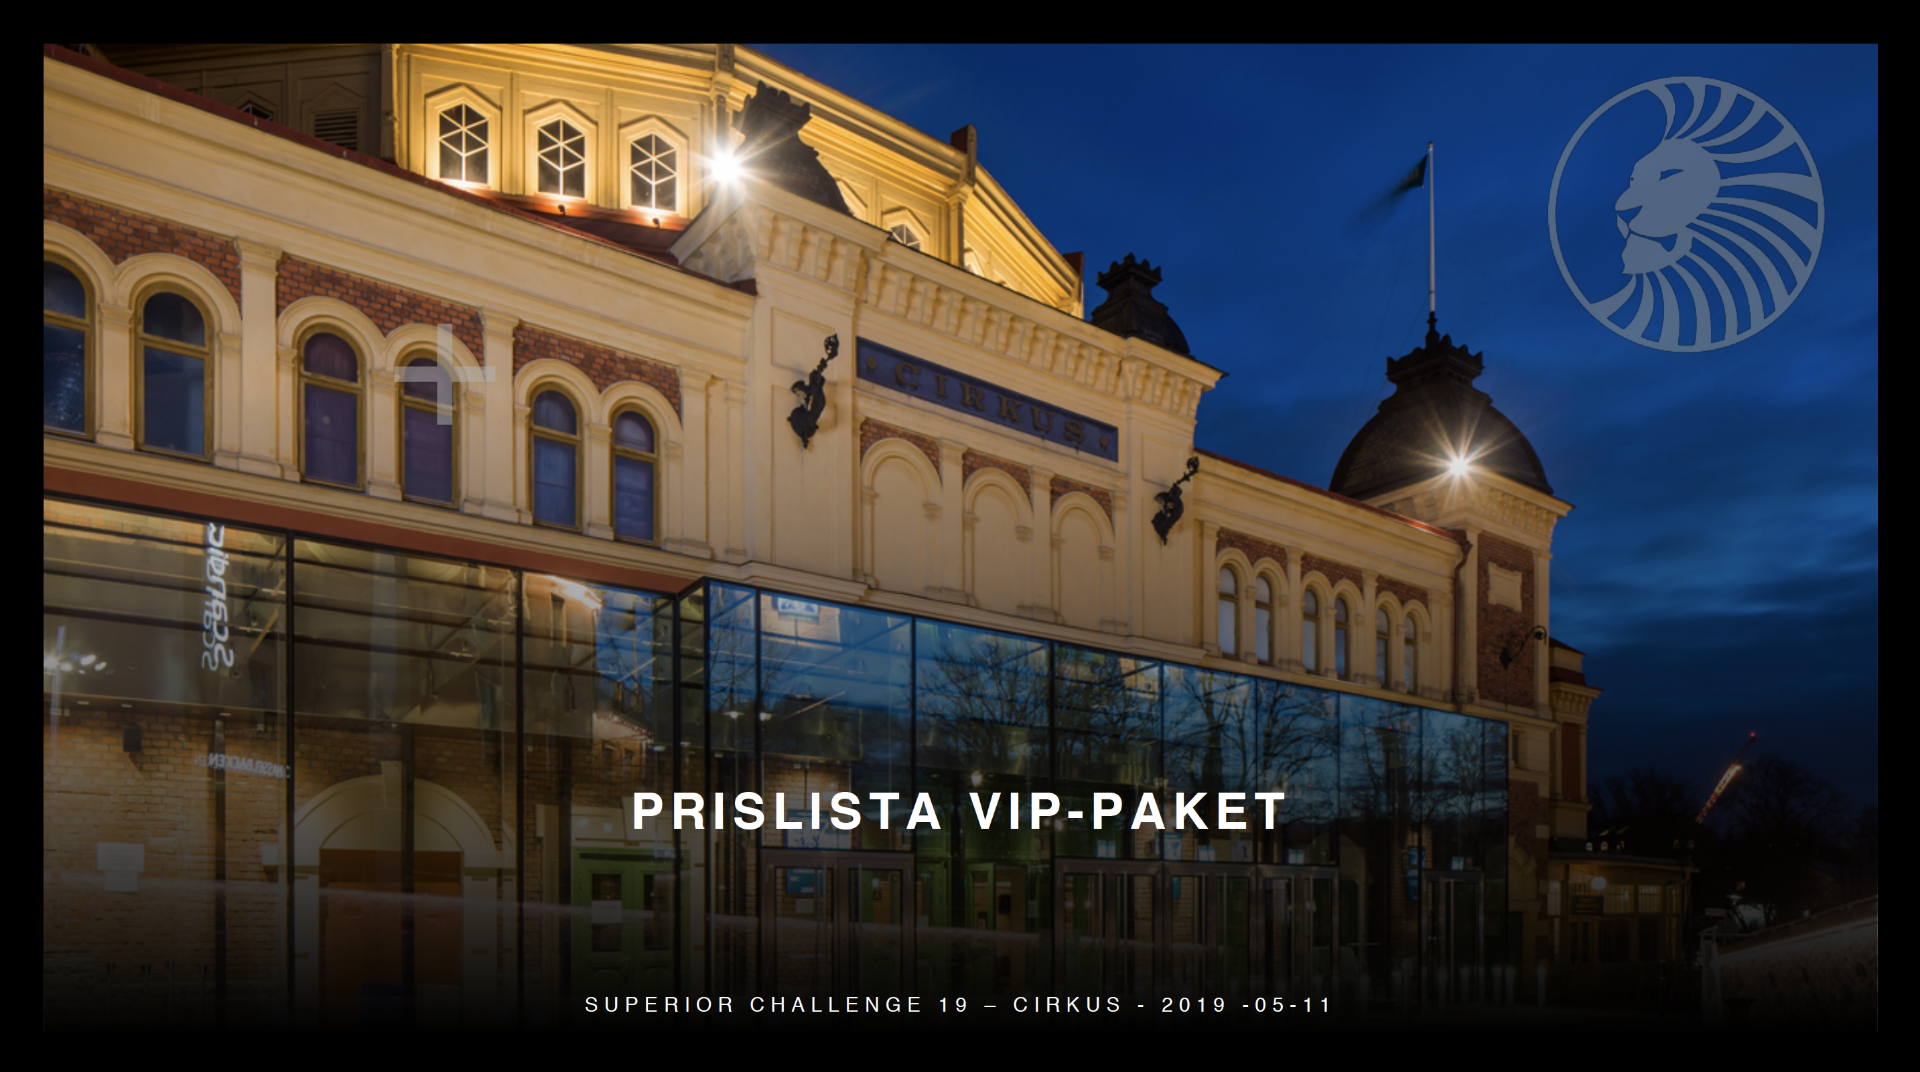 VIP-PAKET SUPERIOR CHALLENGE 19 - CIRKUS